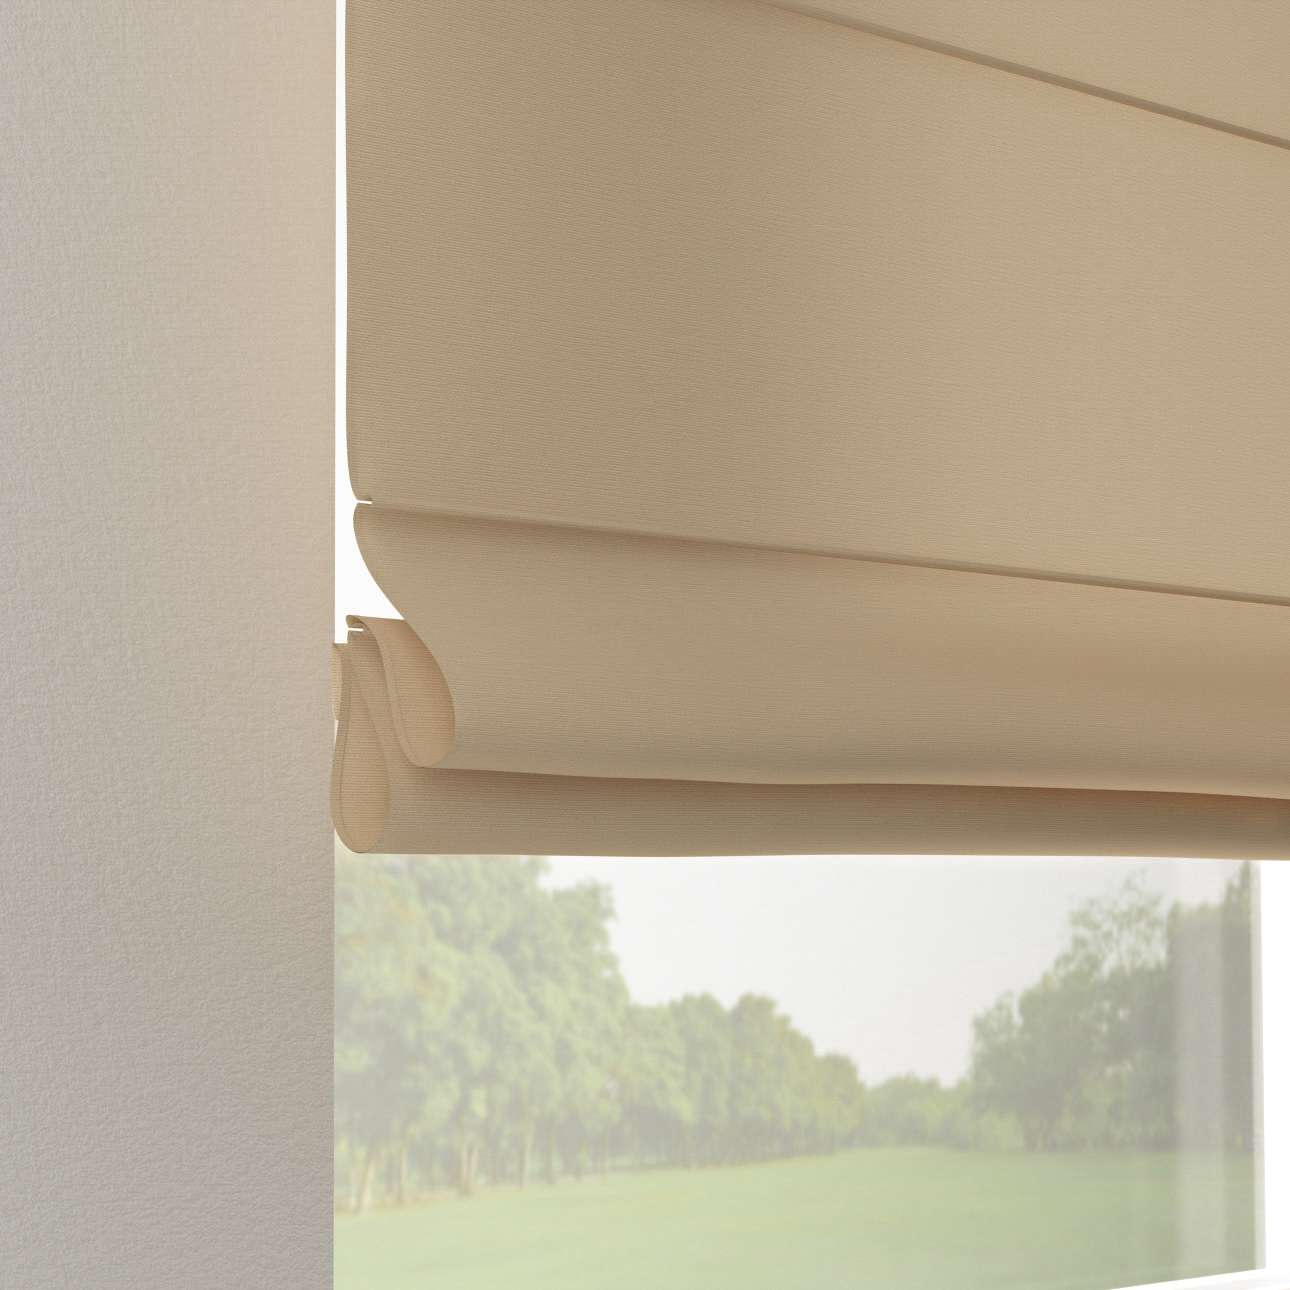 Rímska roleta Verona 80 x 170 cm V kolekcii Cotton Panama, tkanina: 702-01